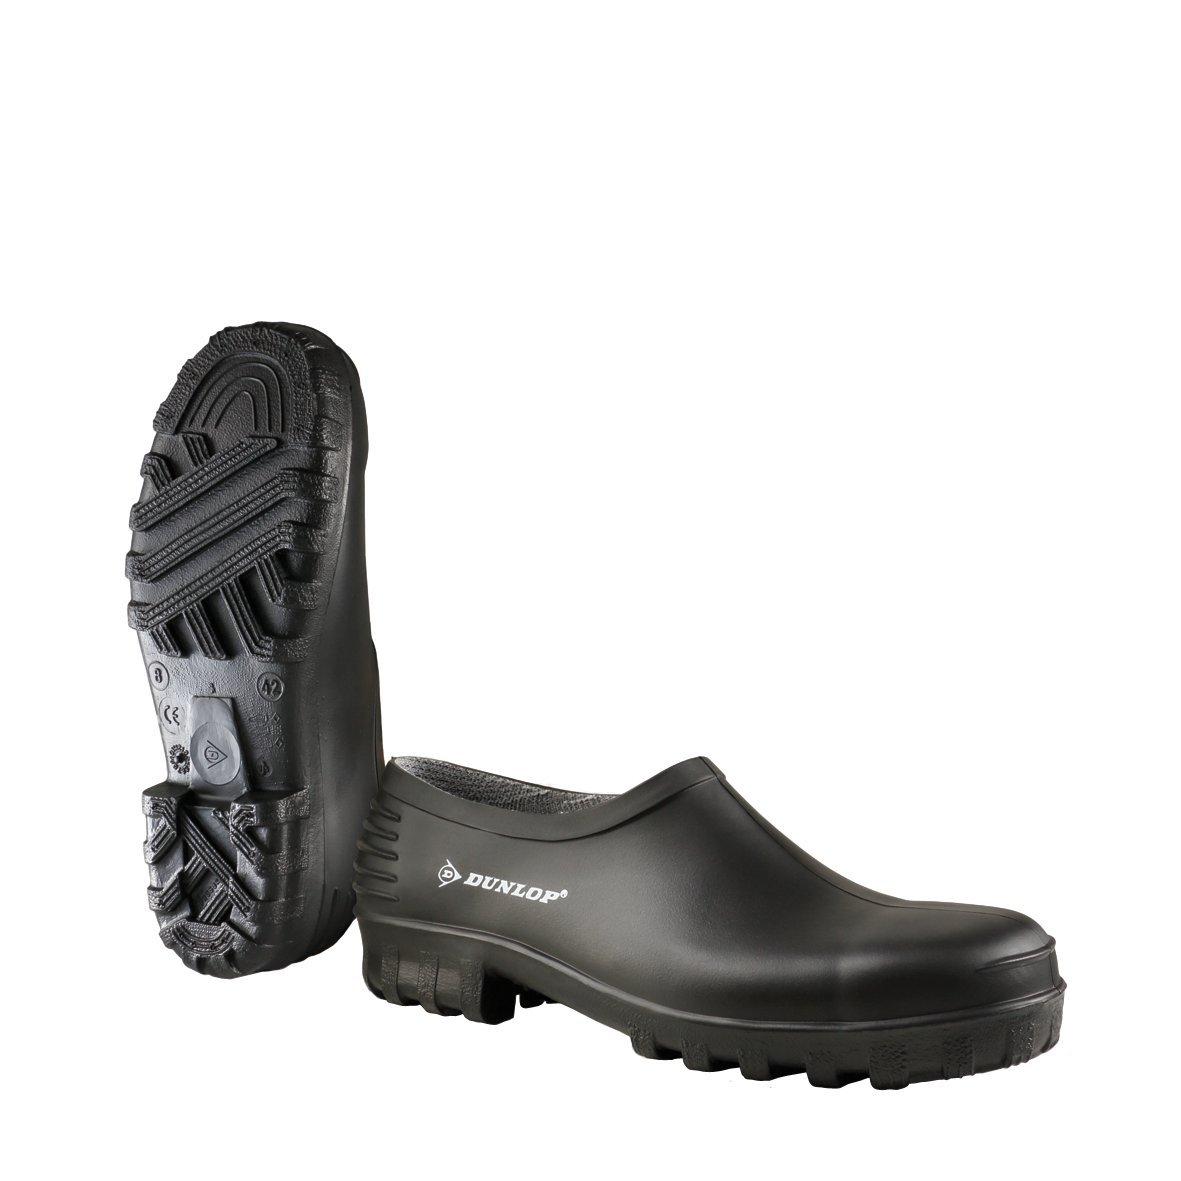 Dunlop Protective Footwear Unisex Adults' Dunlop Wellie Shoe Work Wellingtons 814P